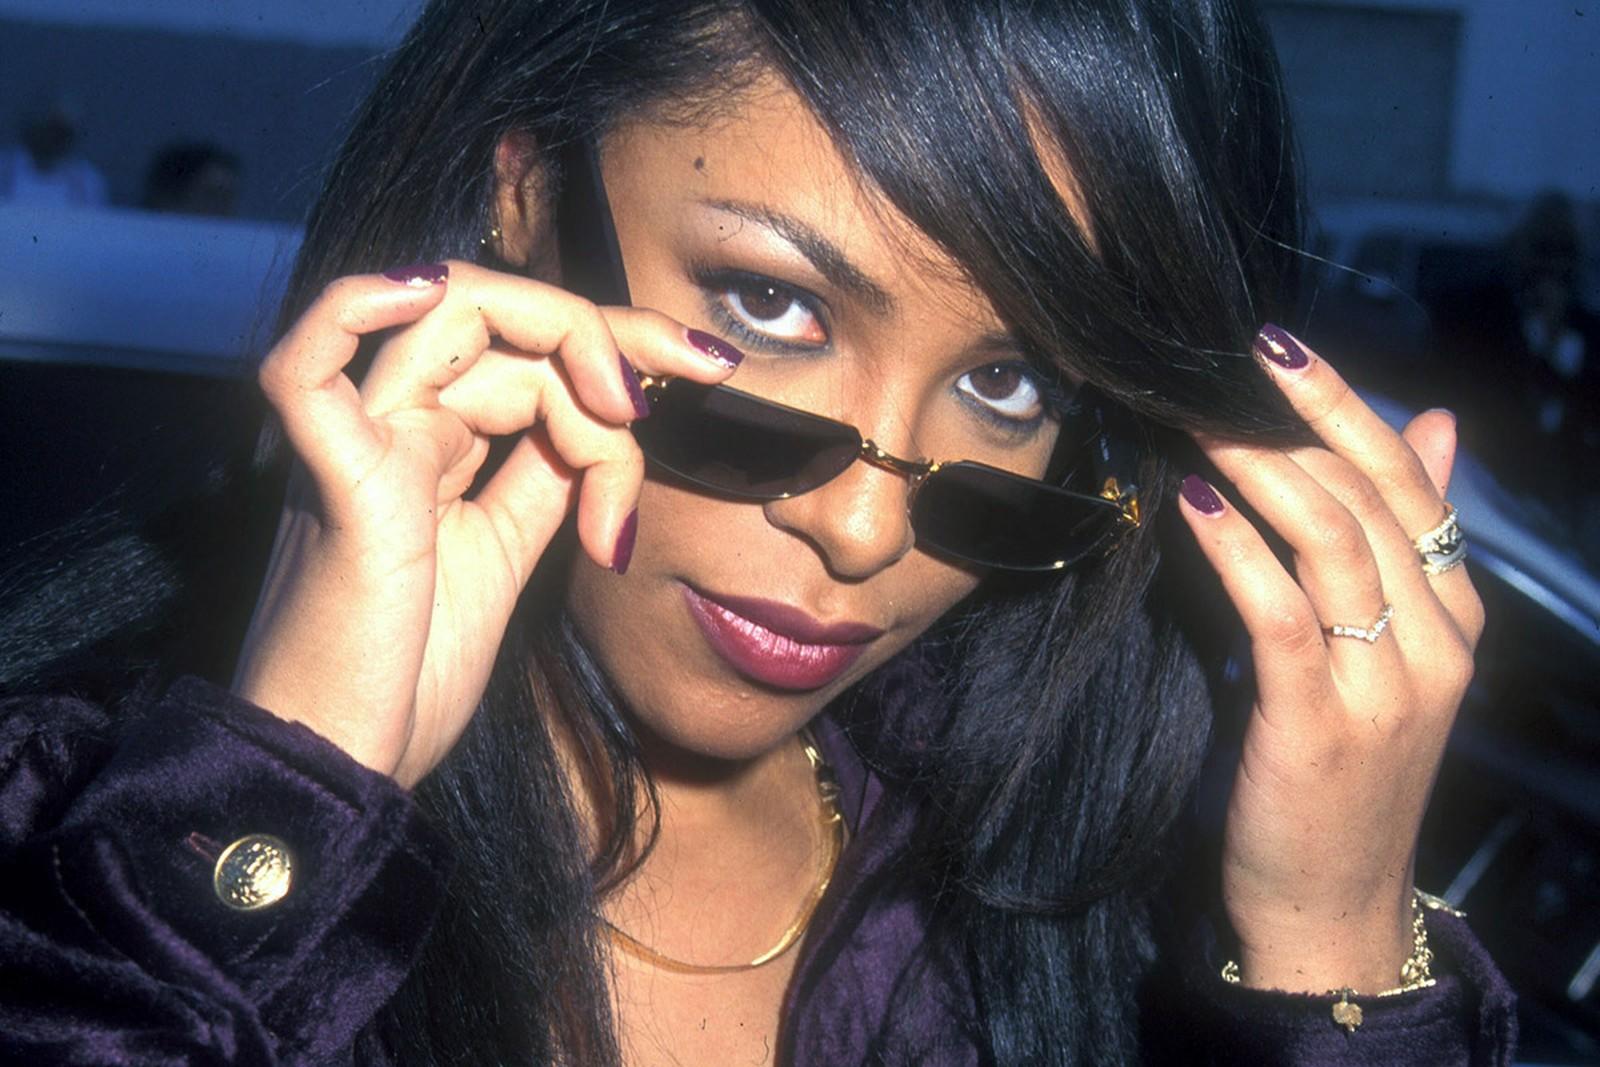 Setelah 20 Tahun, Kini Musik Aaliyah Akhirnya Dirilis di Spotify